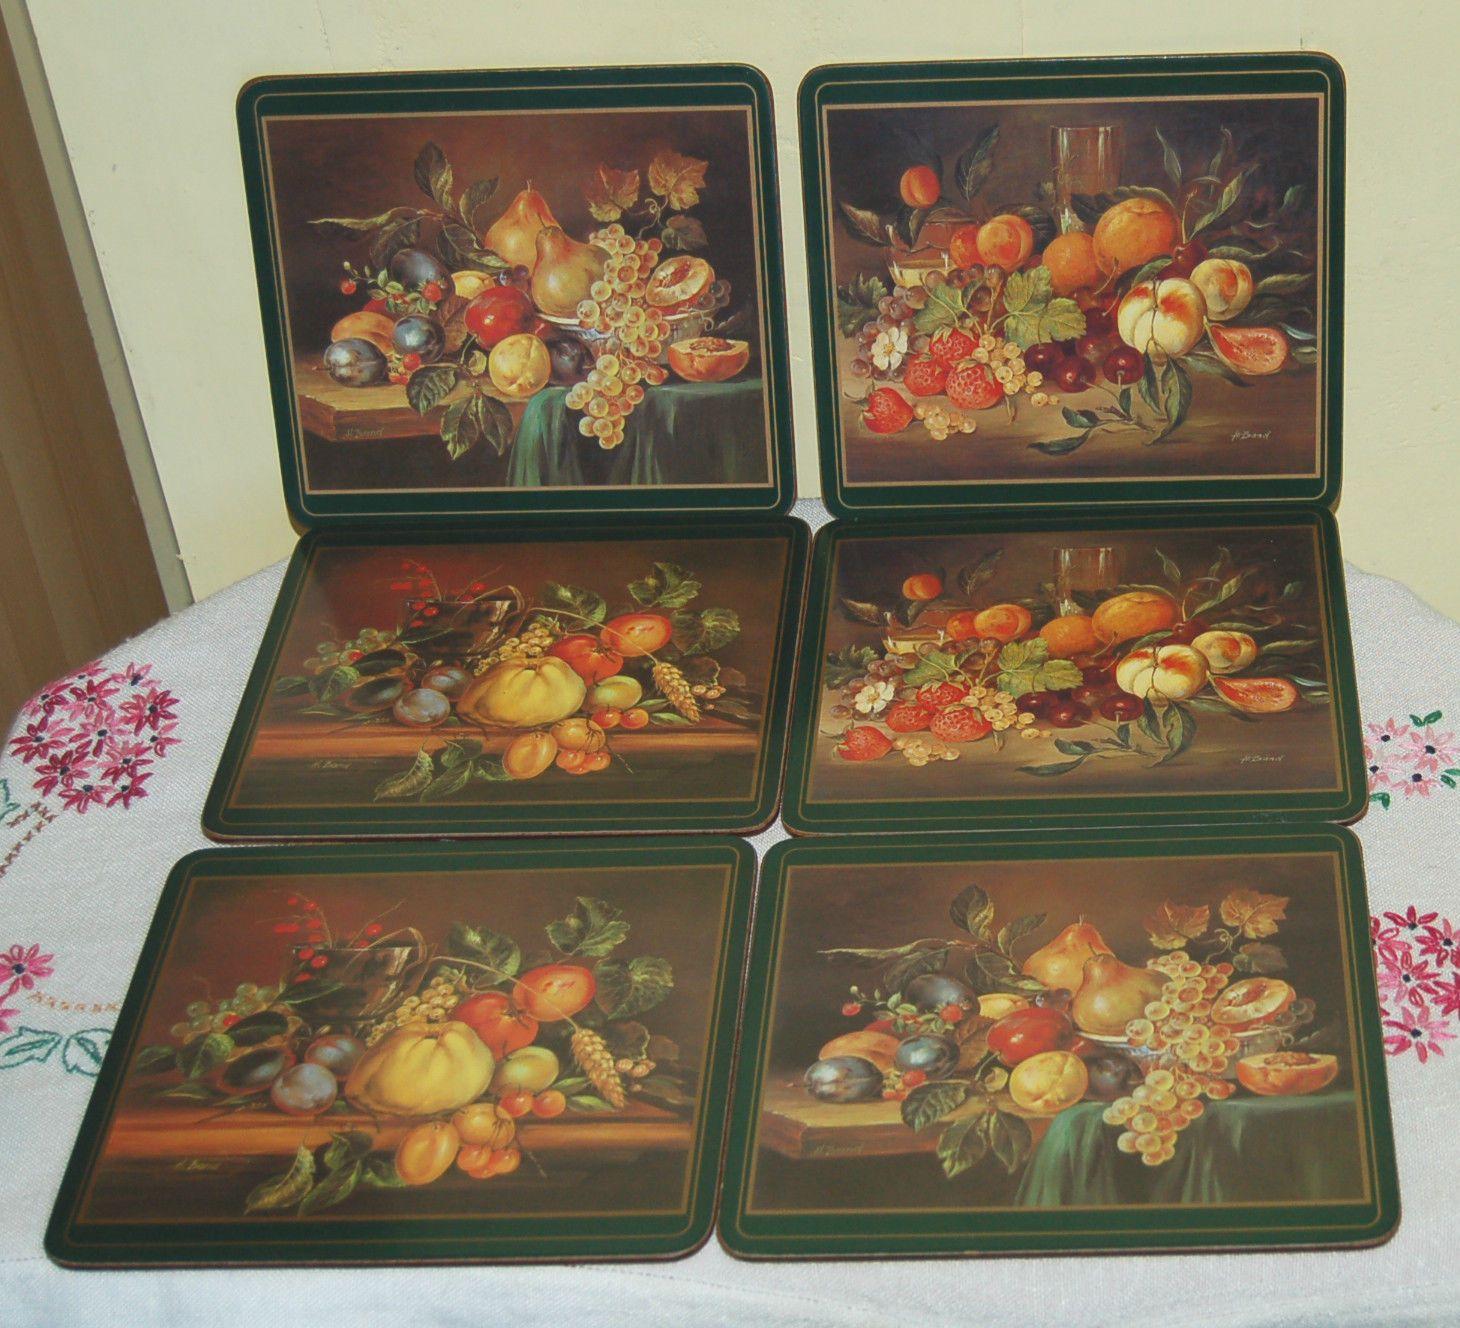 Set of 4 Pimpernel Place Mats in Original Box Four | Pimpernel Place ...